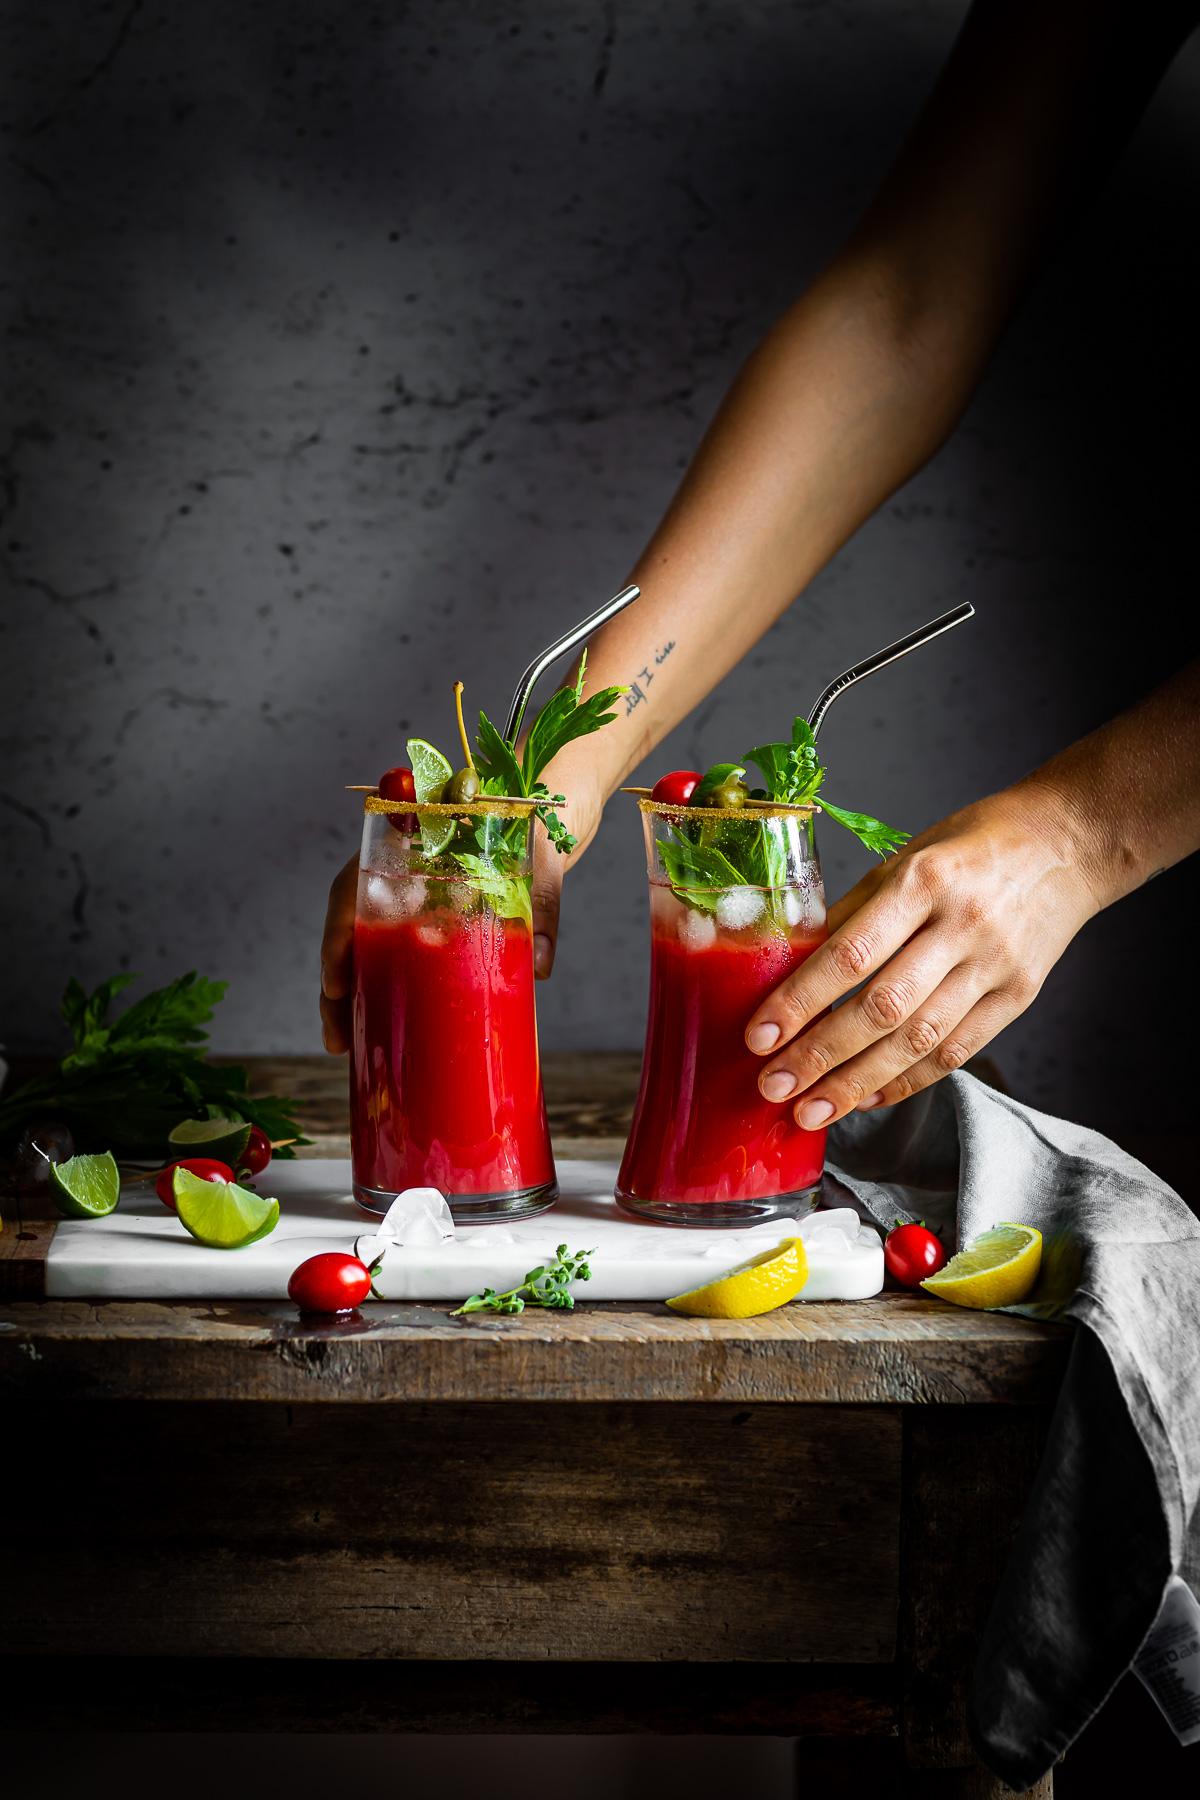 Vegan Water Kefir non alcoholic Bloody Mary recipe #cocktail ricetta Bloody Mary Analcolico al Kefir d acqua per brunch e festa sano rinfrescante succo di pomodoro